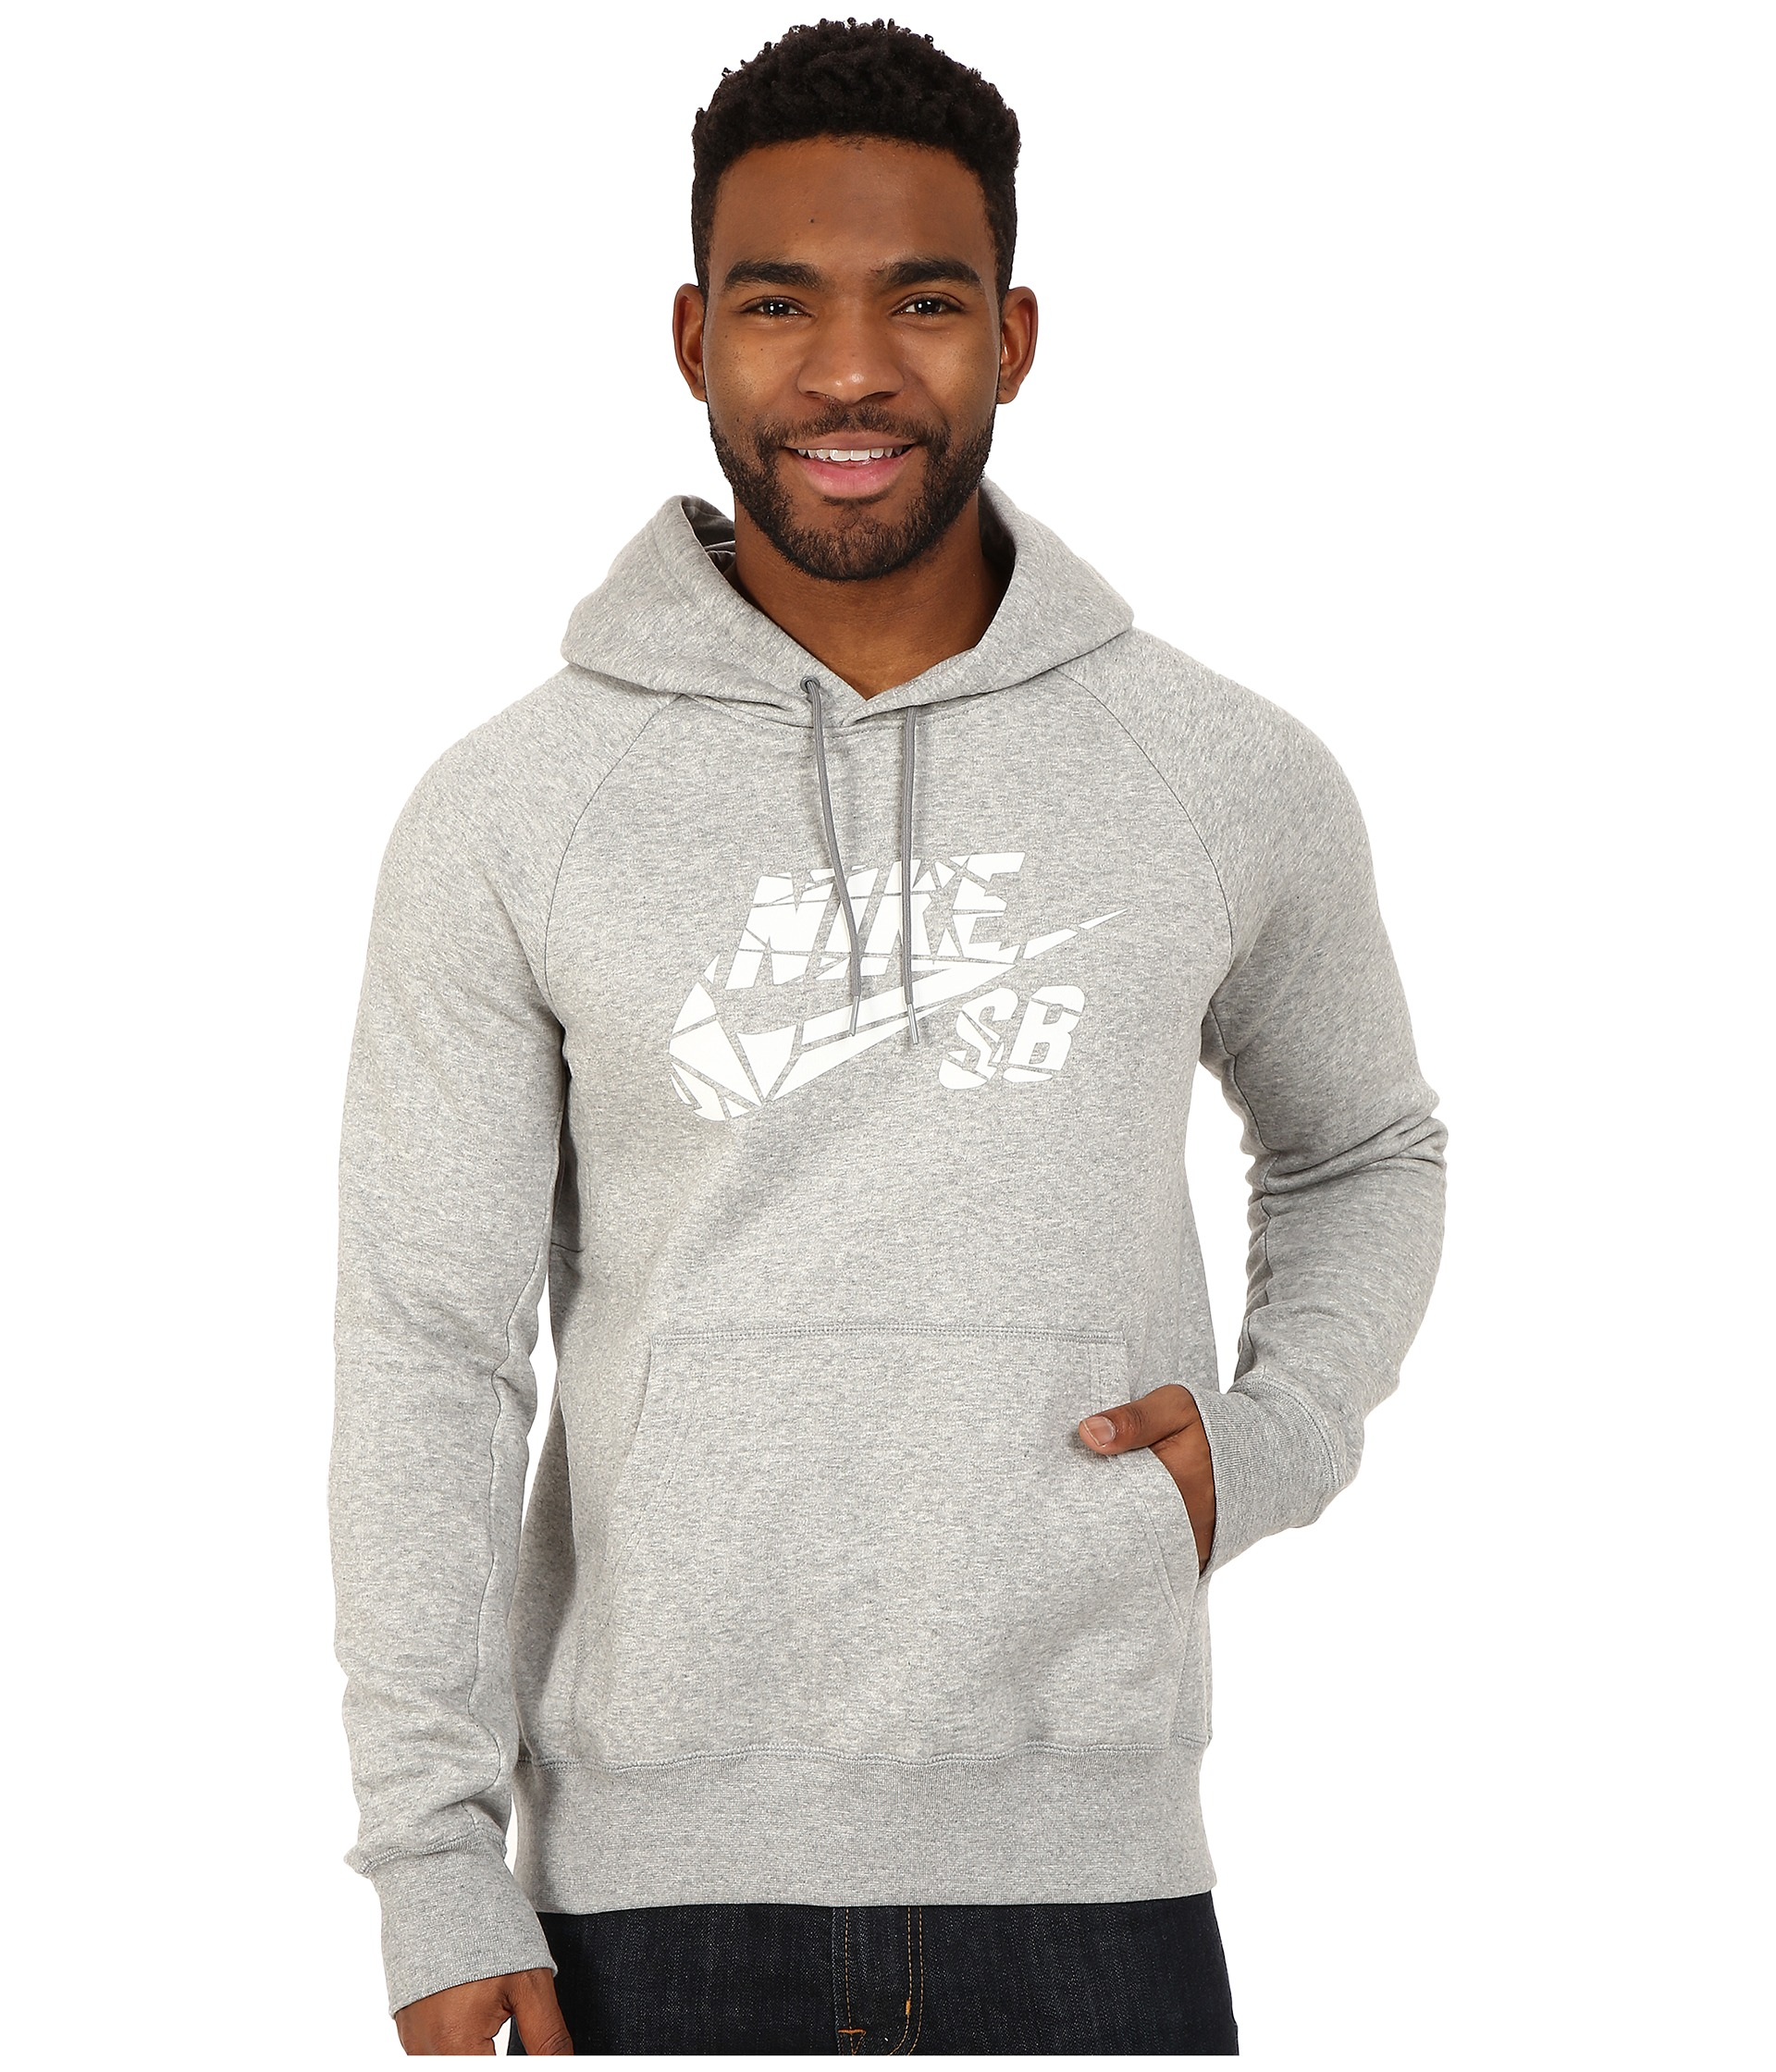 824b43af6 Nike Sb Icon Griptape Po Hoodie in Gray for Men - Lyst